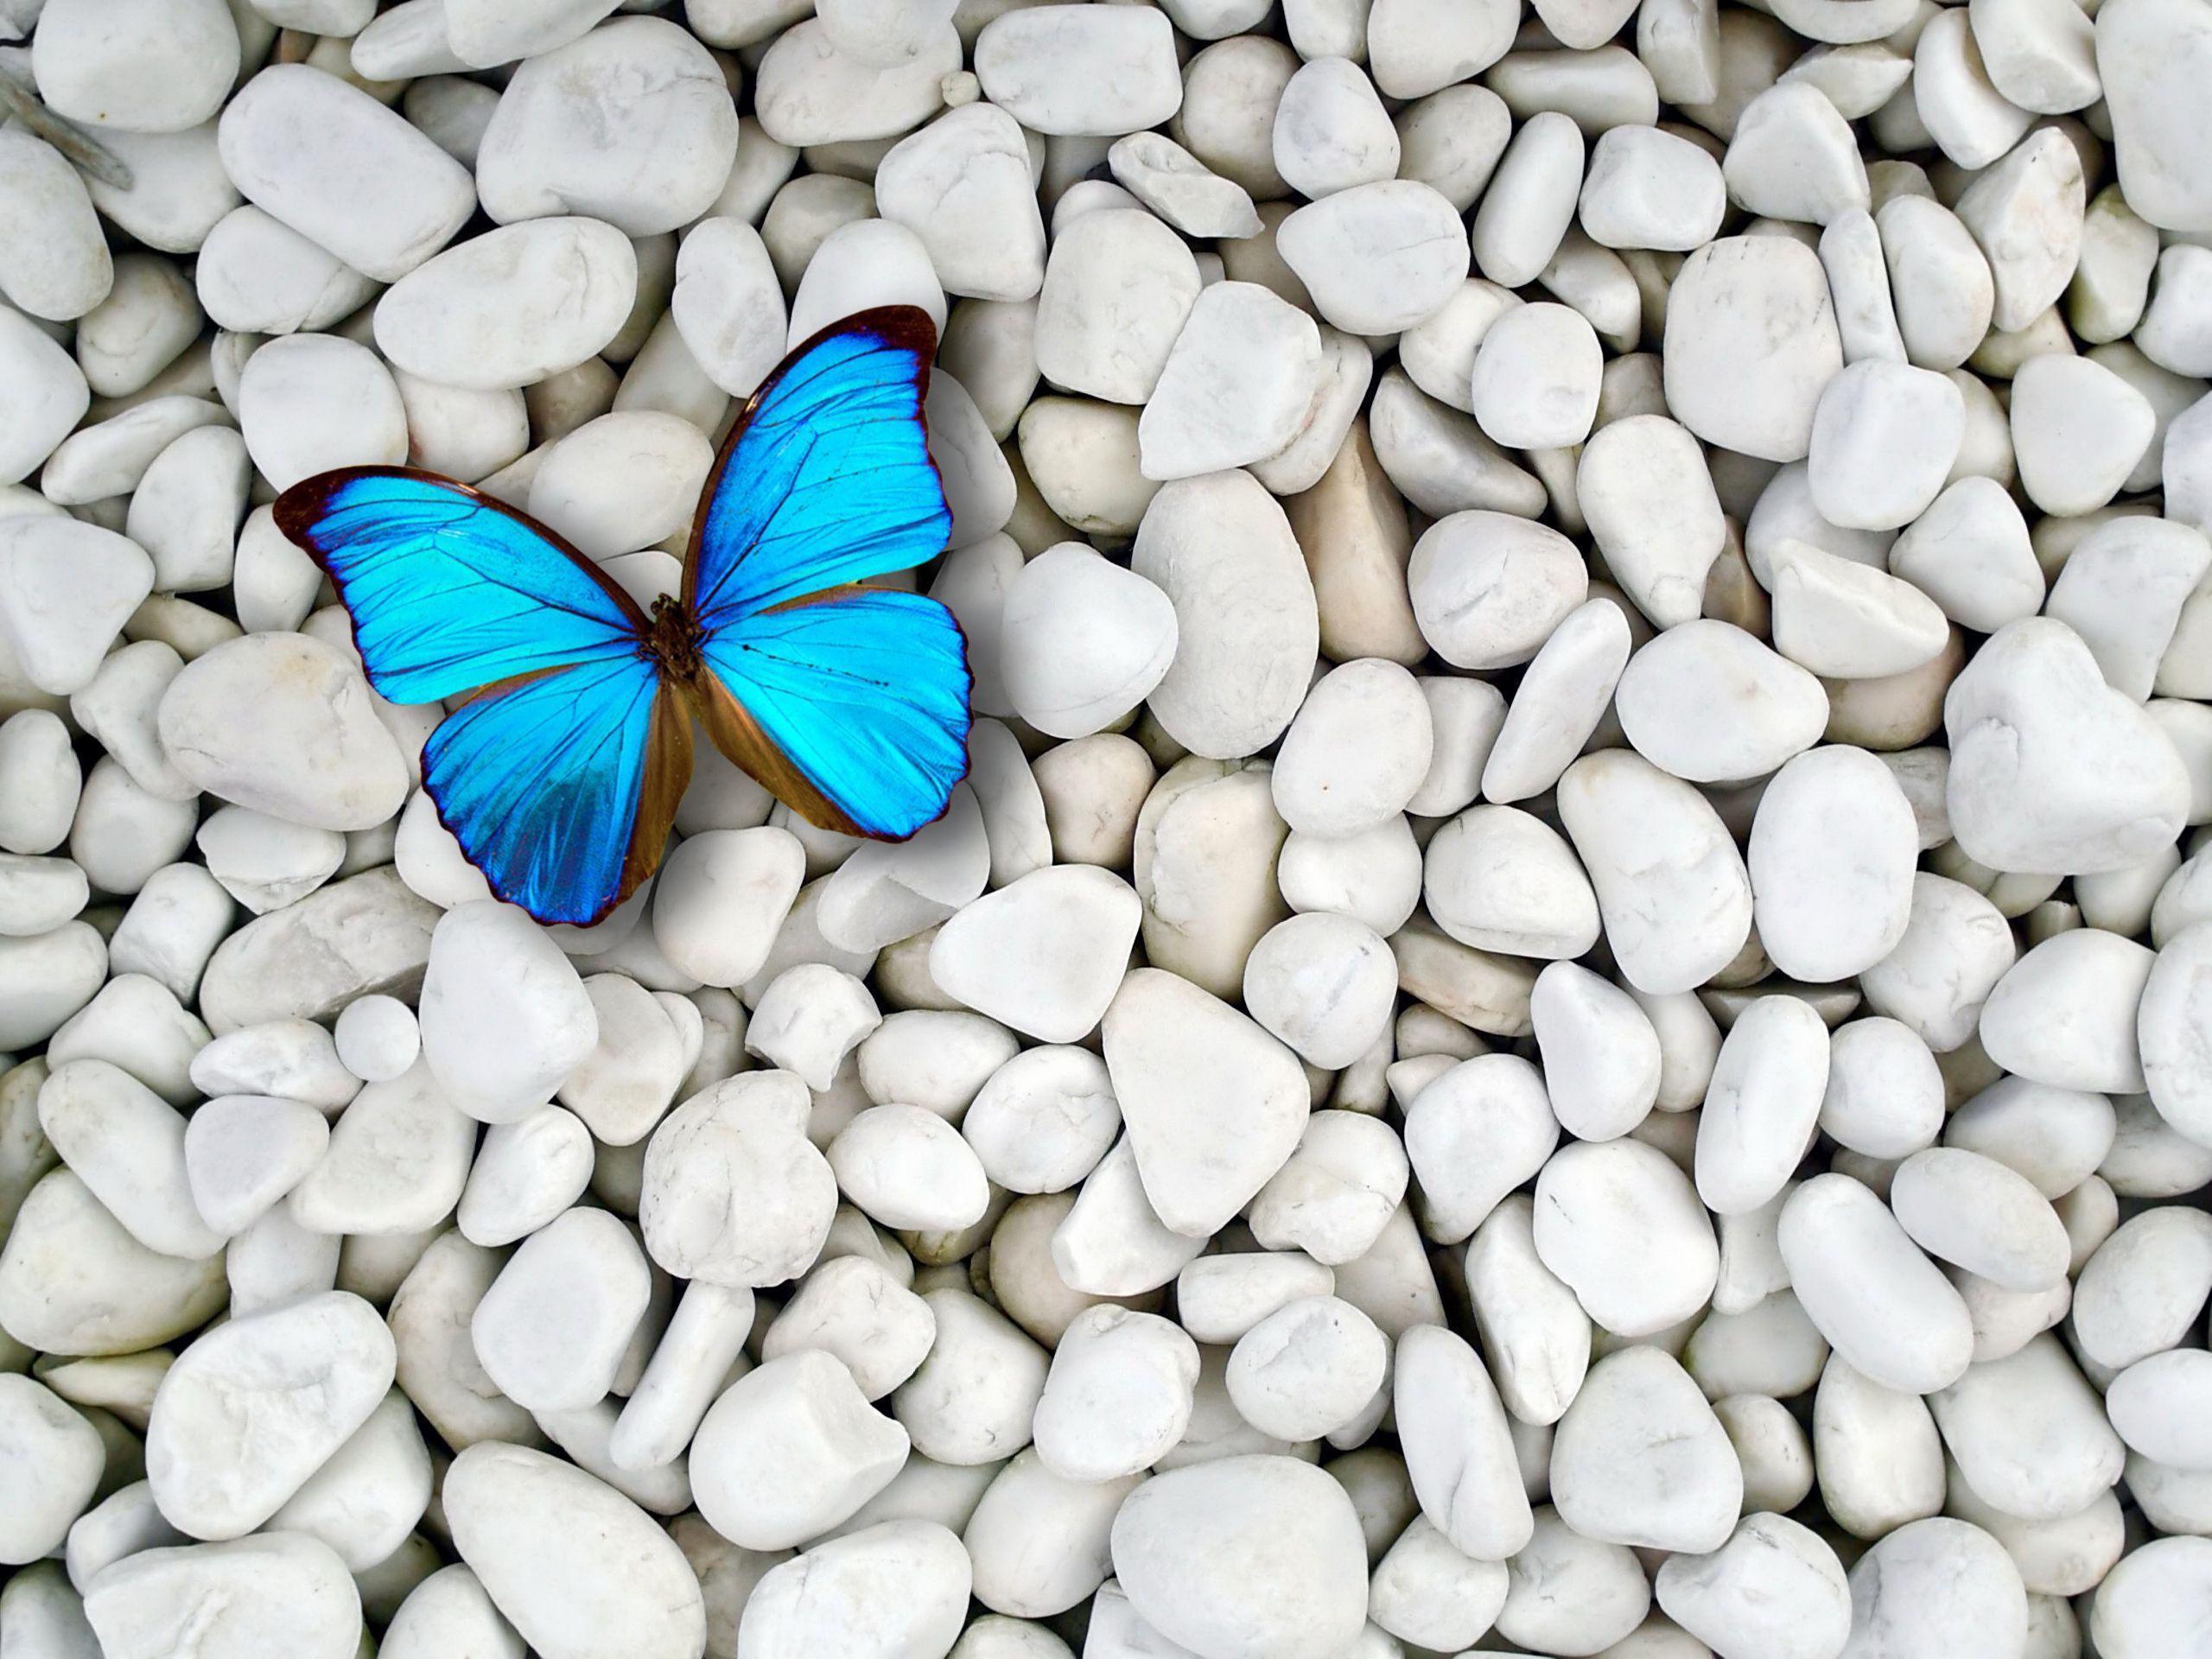 Butterfly Desktop Wallpapers Top Free Butterfly Desktop Backgrounds Wallpaperaccess